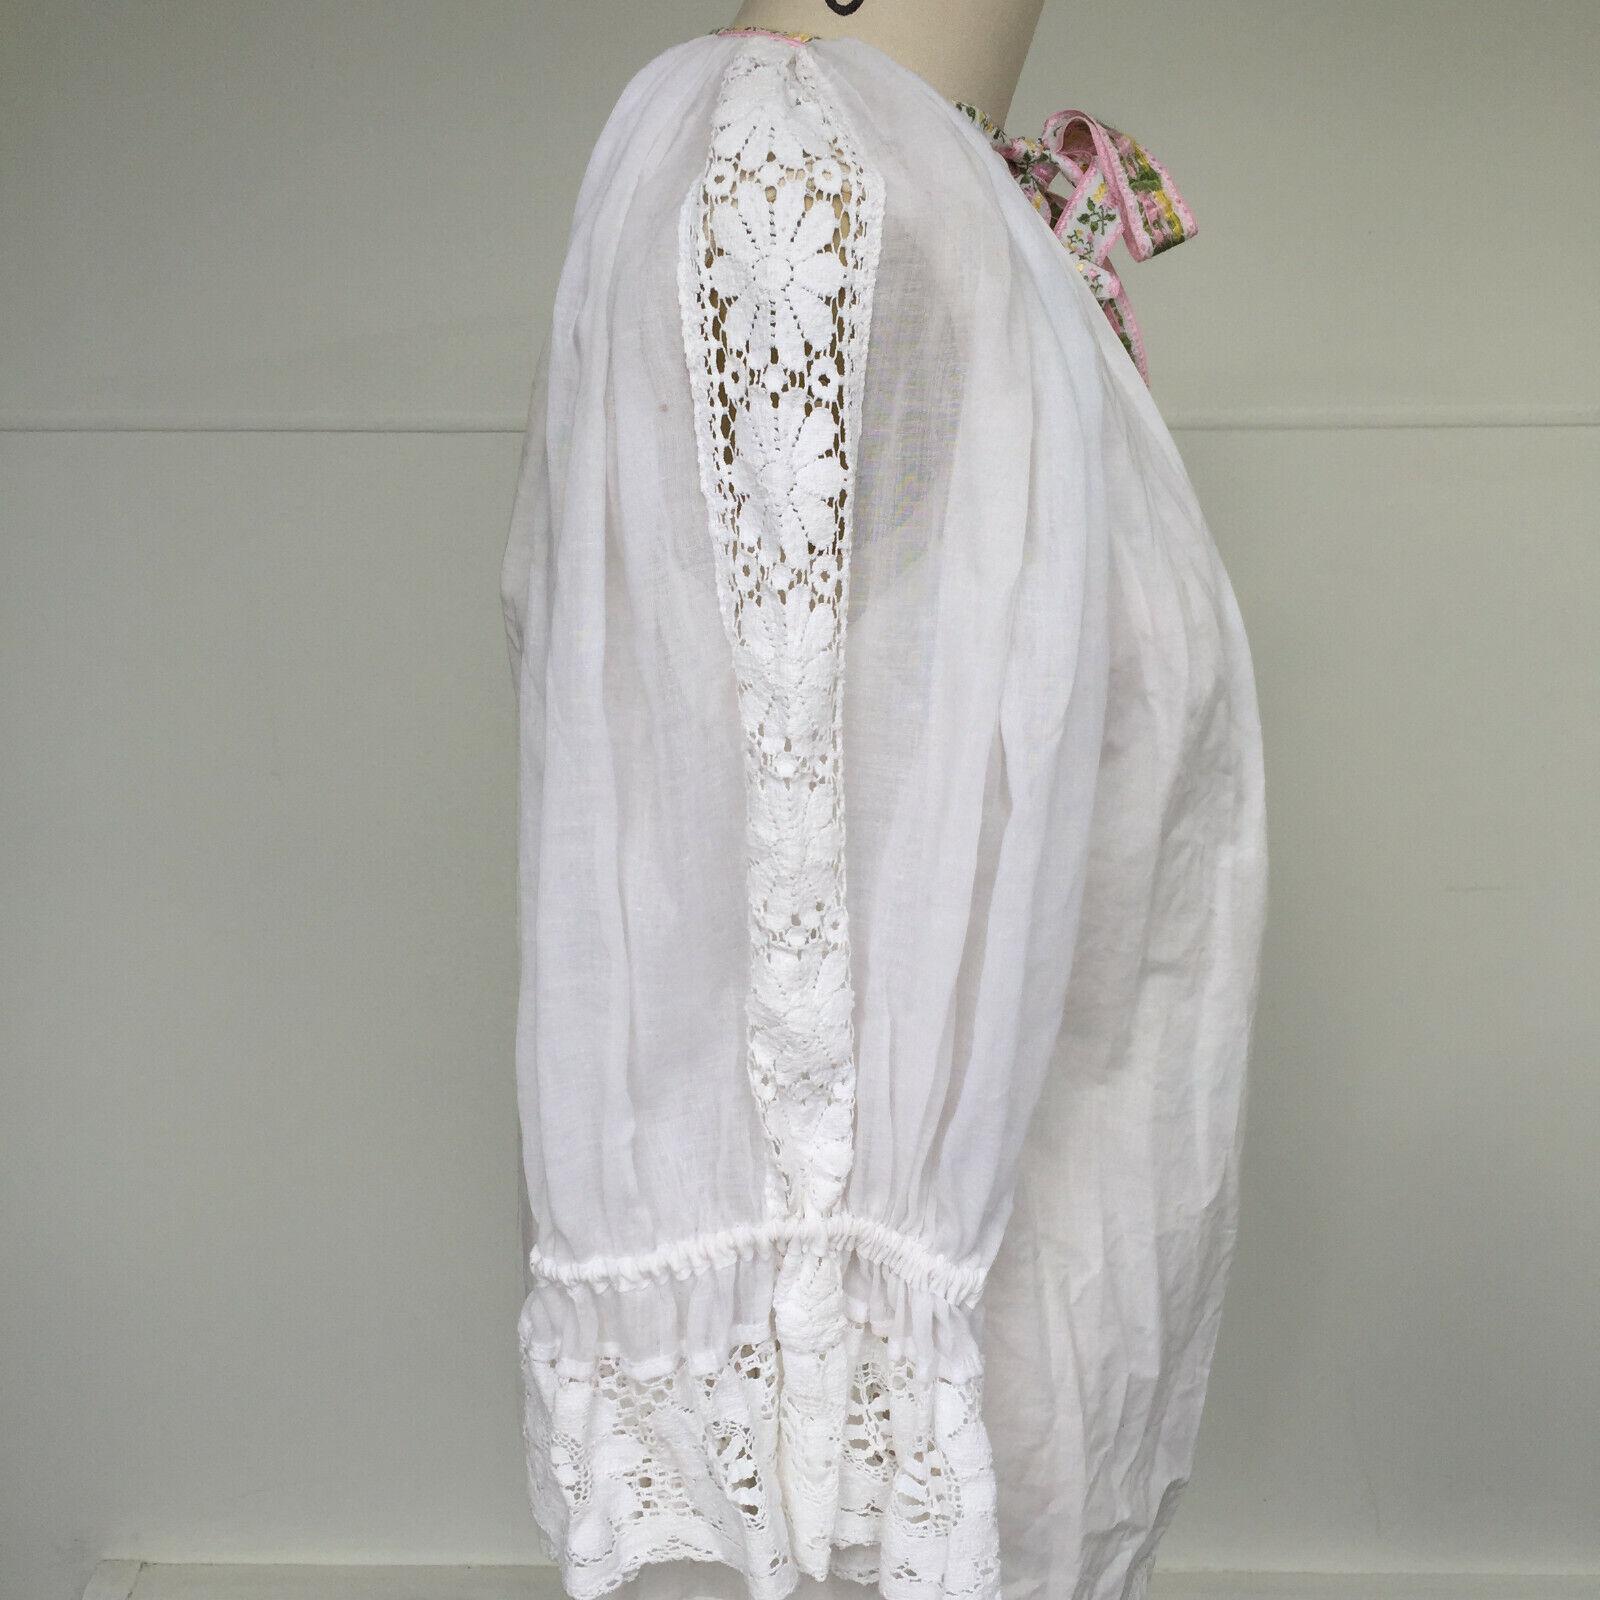 VTG 1970s Hungarian Handmade Textured Boho-Chic P… - image 6